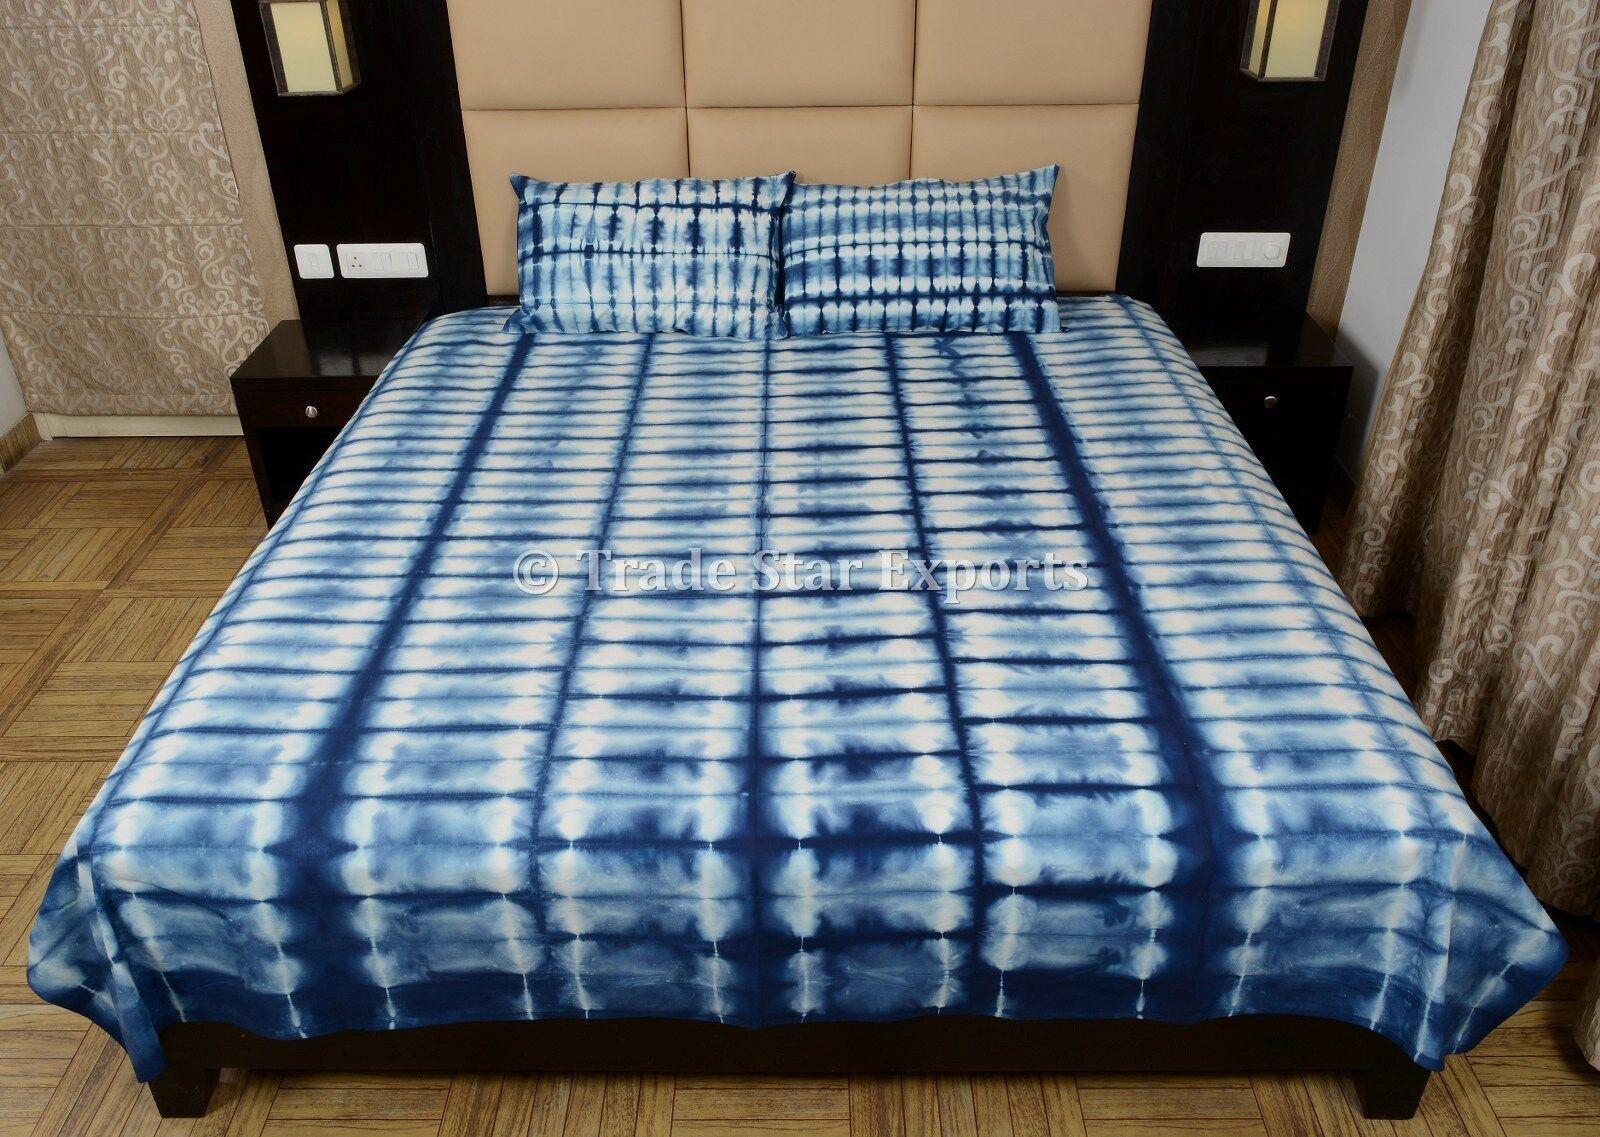 Indigo Tie Dye Shibori Bedspread Handmade Cotton Bedding with Two Pillow Cases